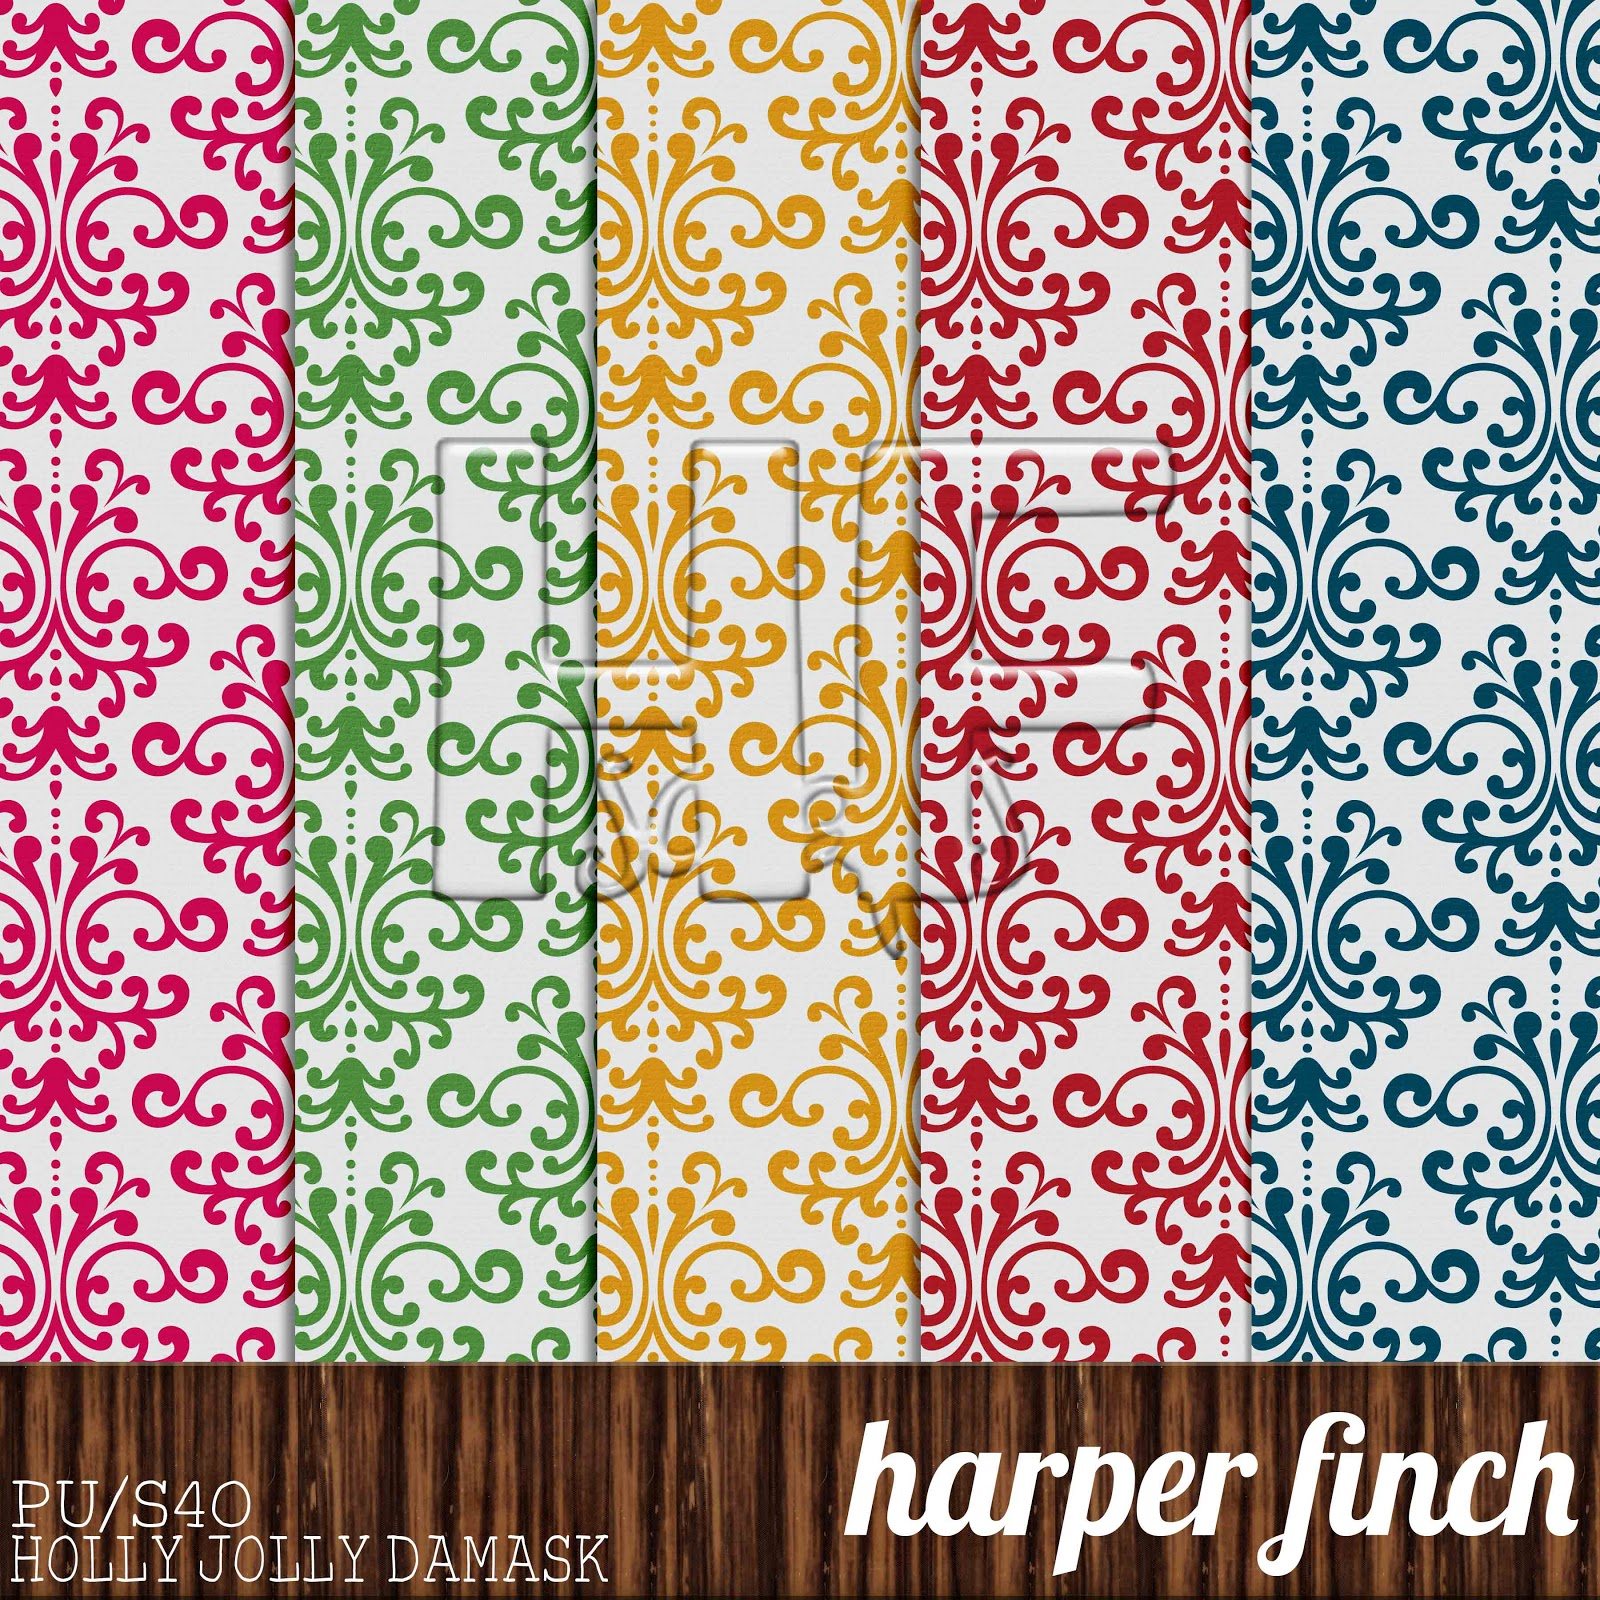 Harper Finch: December 2012